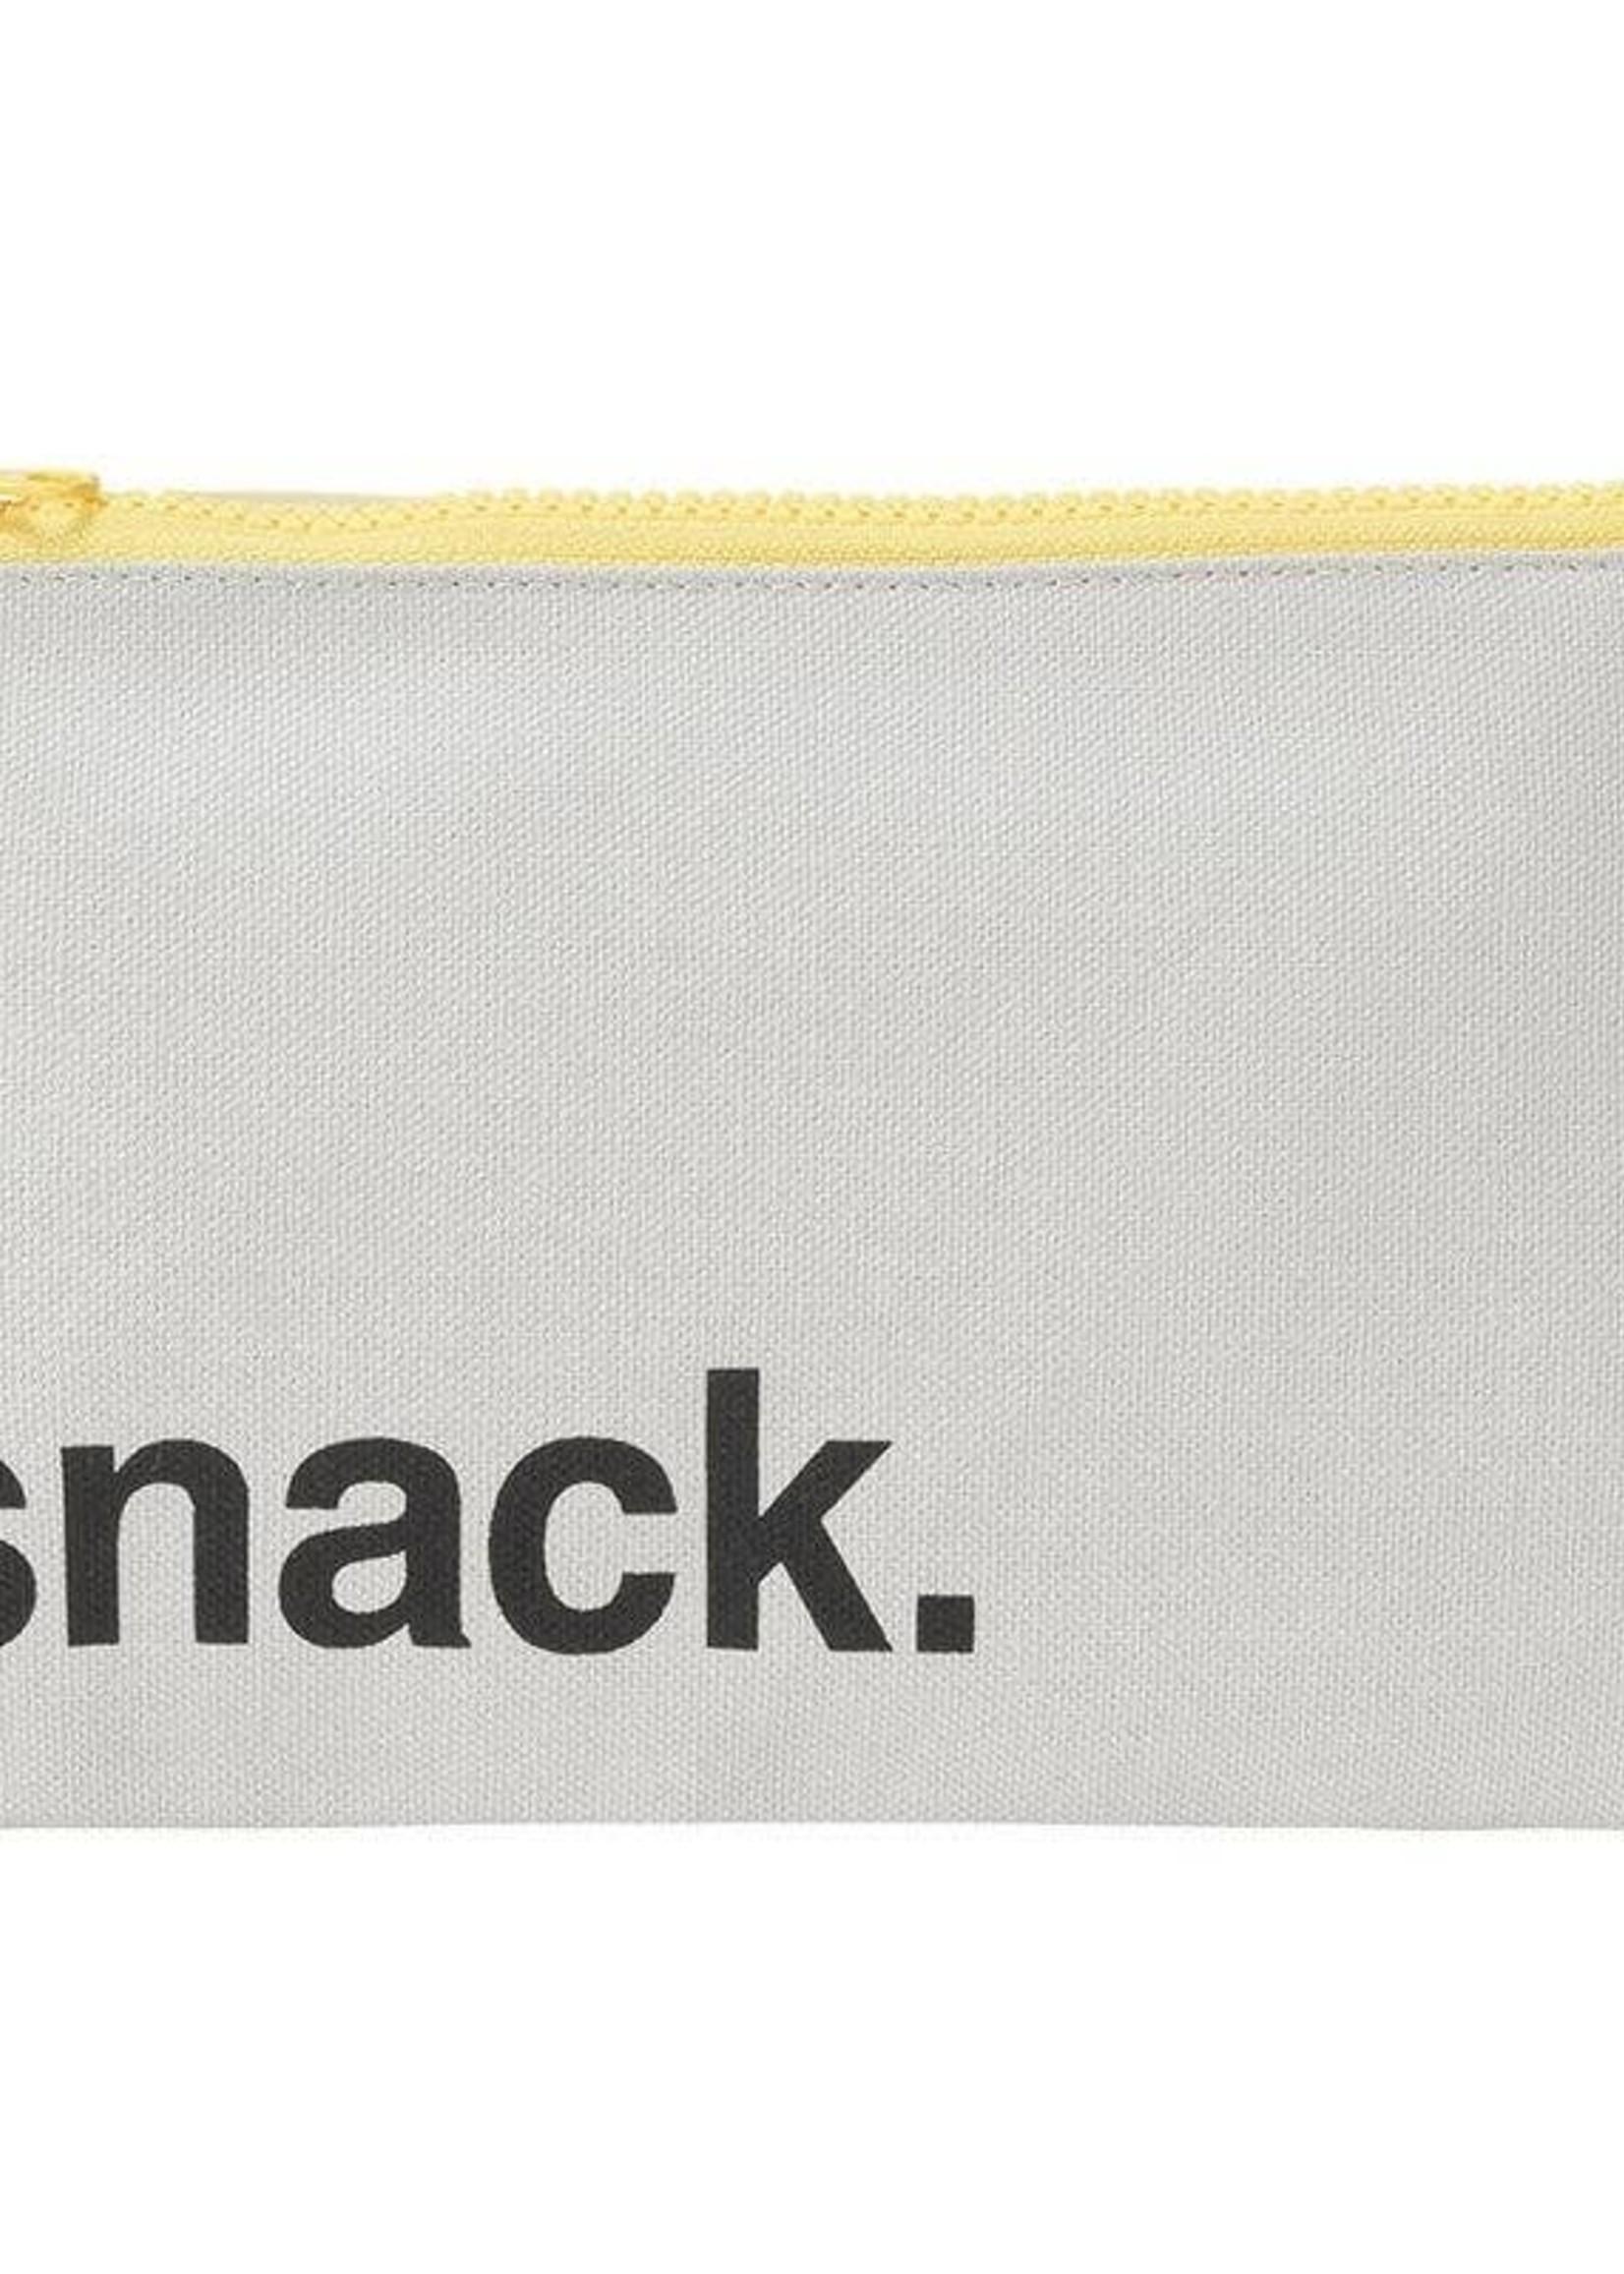 fluf Zip Snack Sack- Black with Blue Zip (Snack Size)